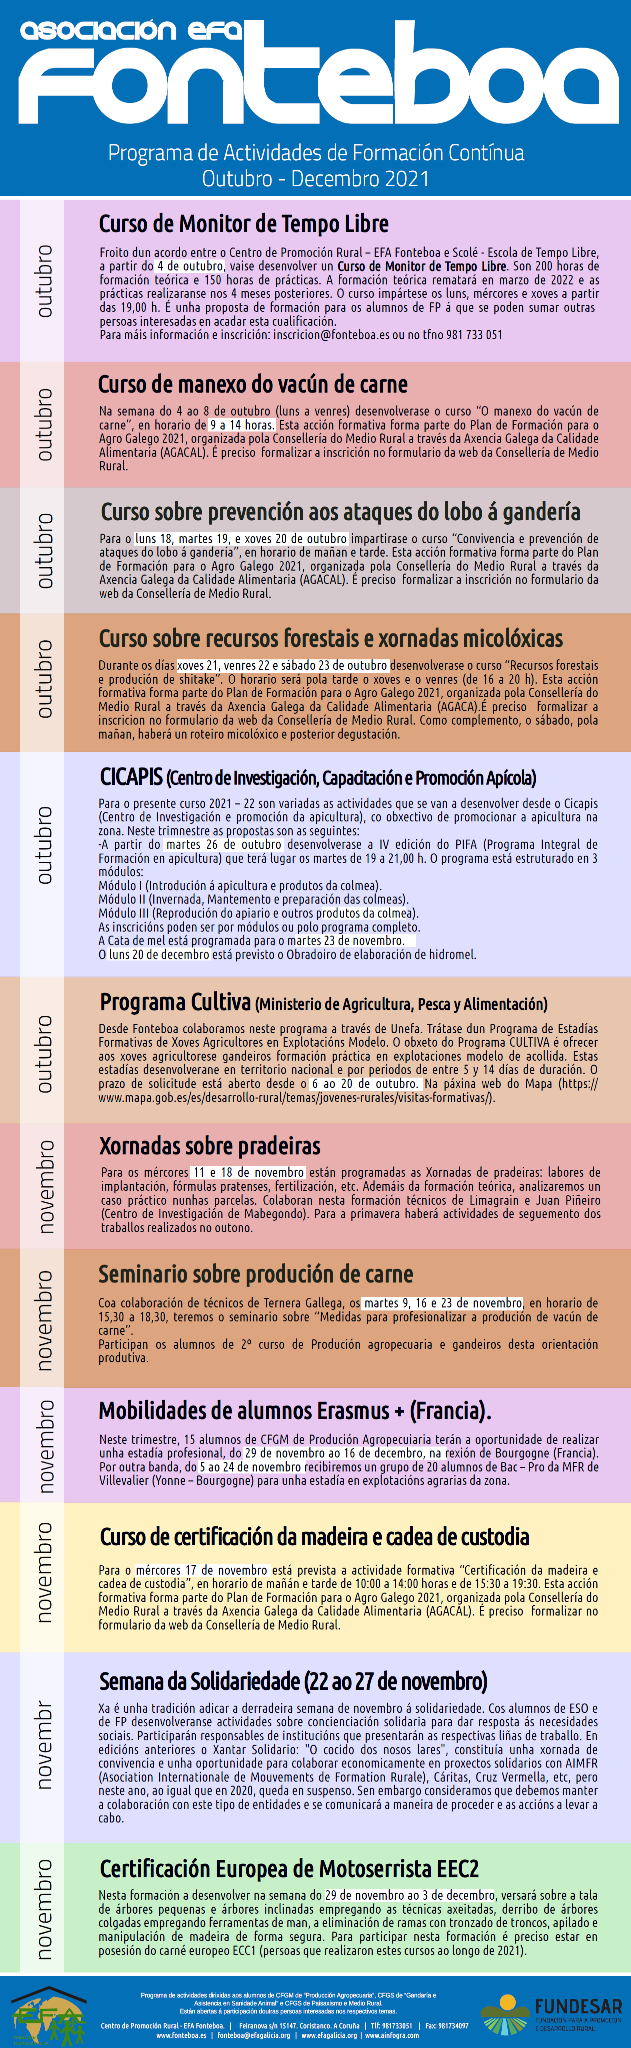 FONTEBOA CURSOS CUARTO TRIMESTRE 21